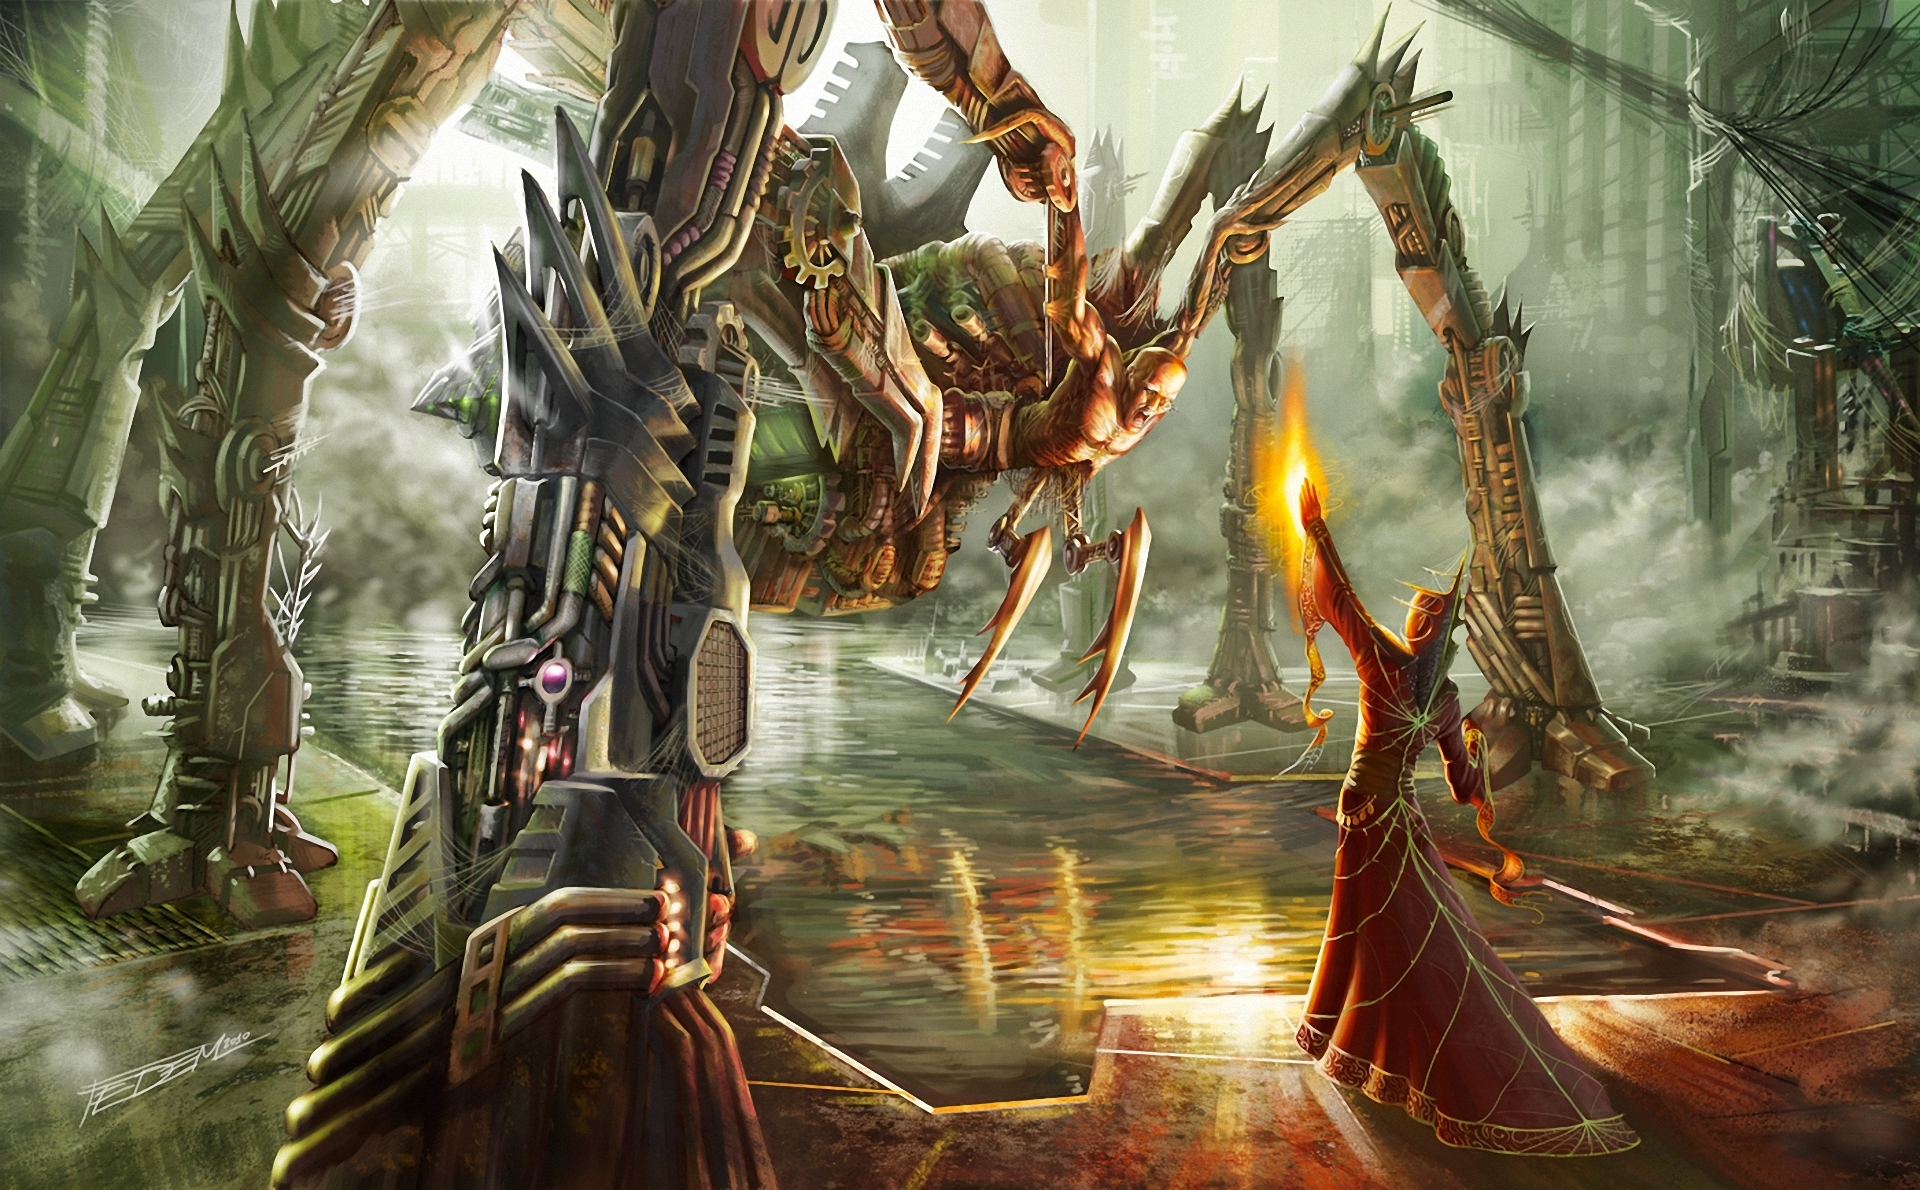 artwork Fantasy Art Mech Robot Spider Digital Art Wallpapers